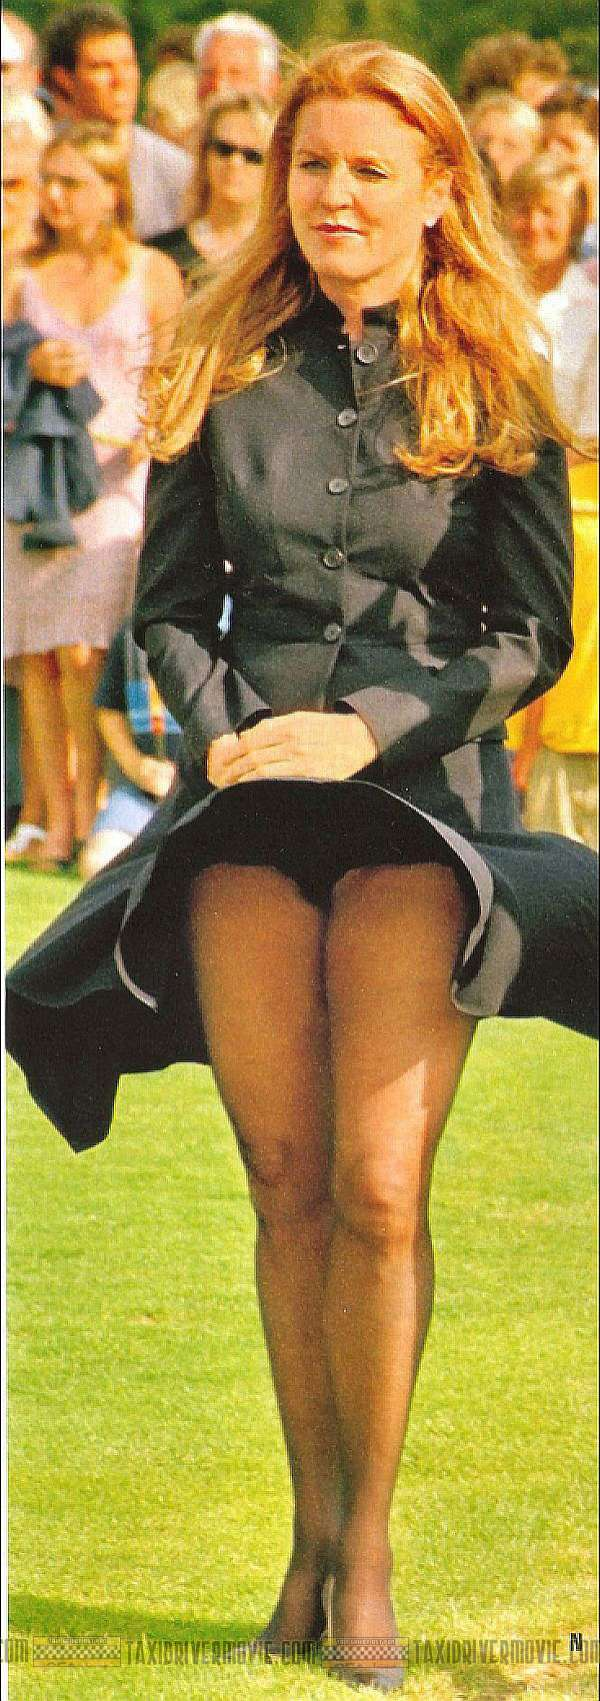 SARAH FERGUSON A Royal Black Panty Upskirt Shot Is Boring, So We Made You Sexier